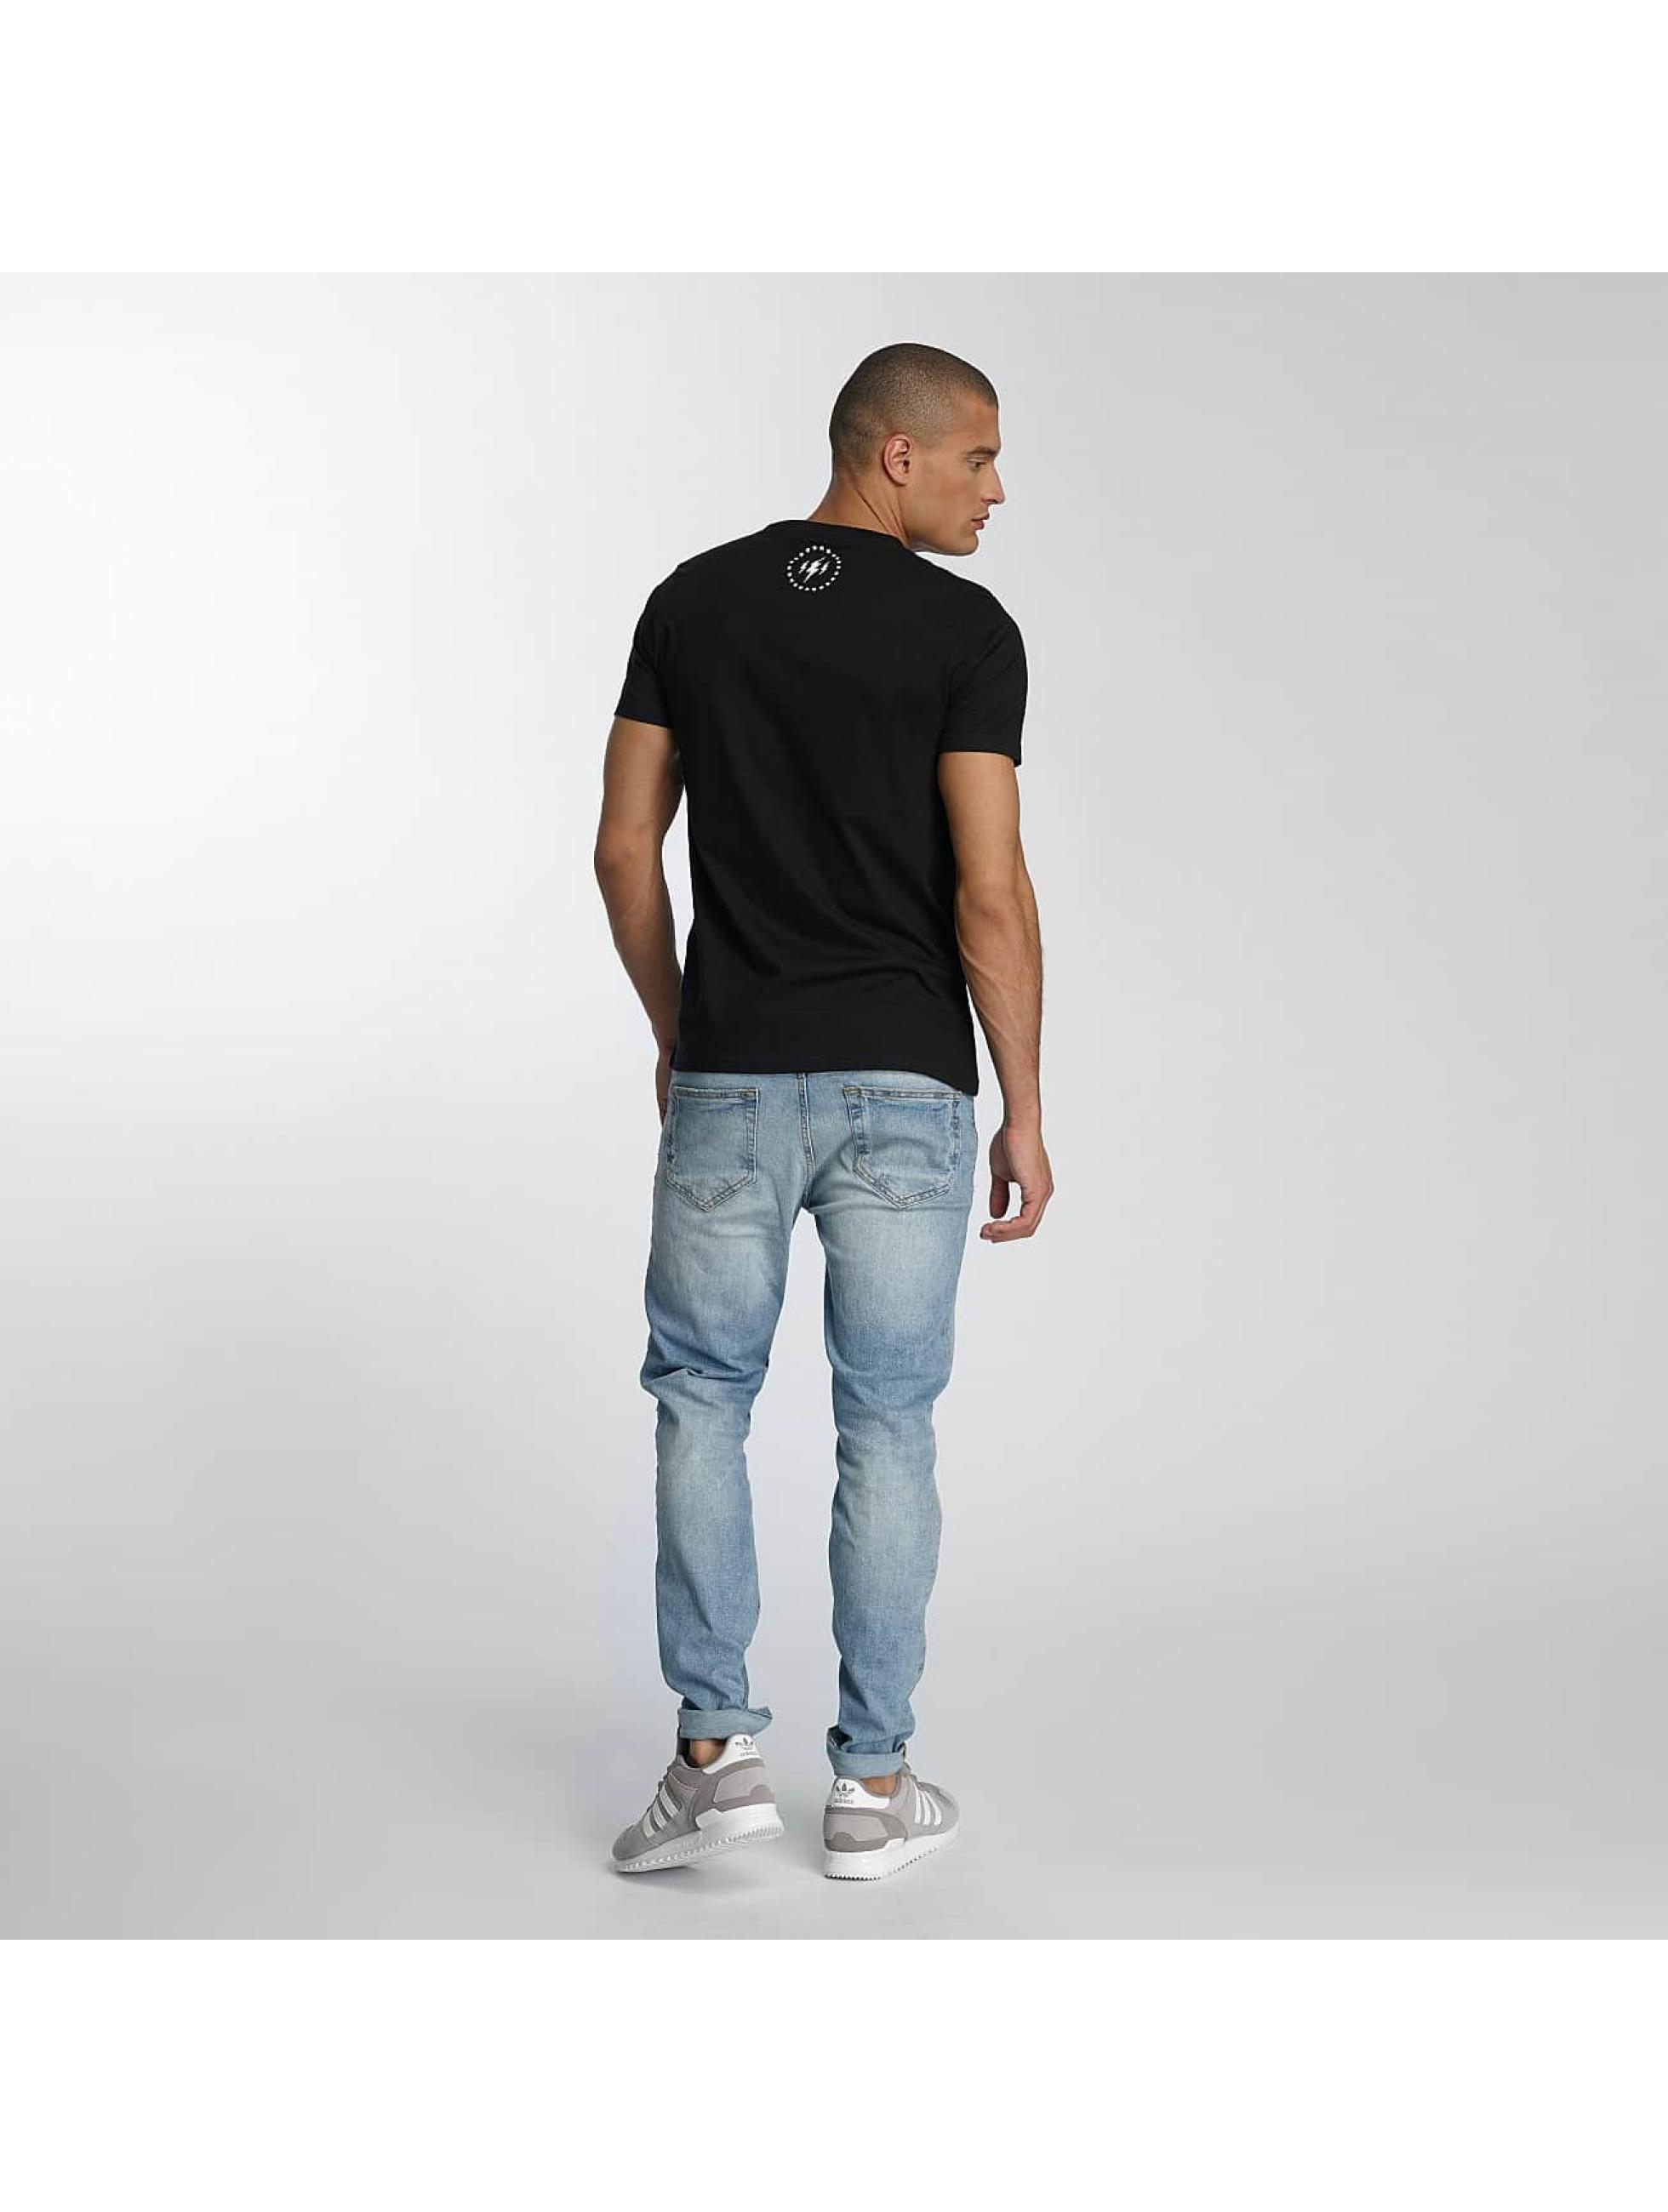 TrueSpin T-shirts 6 sort